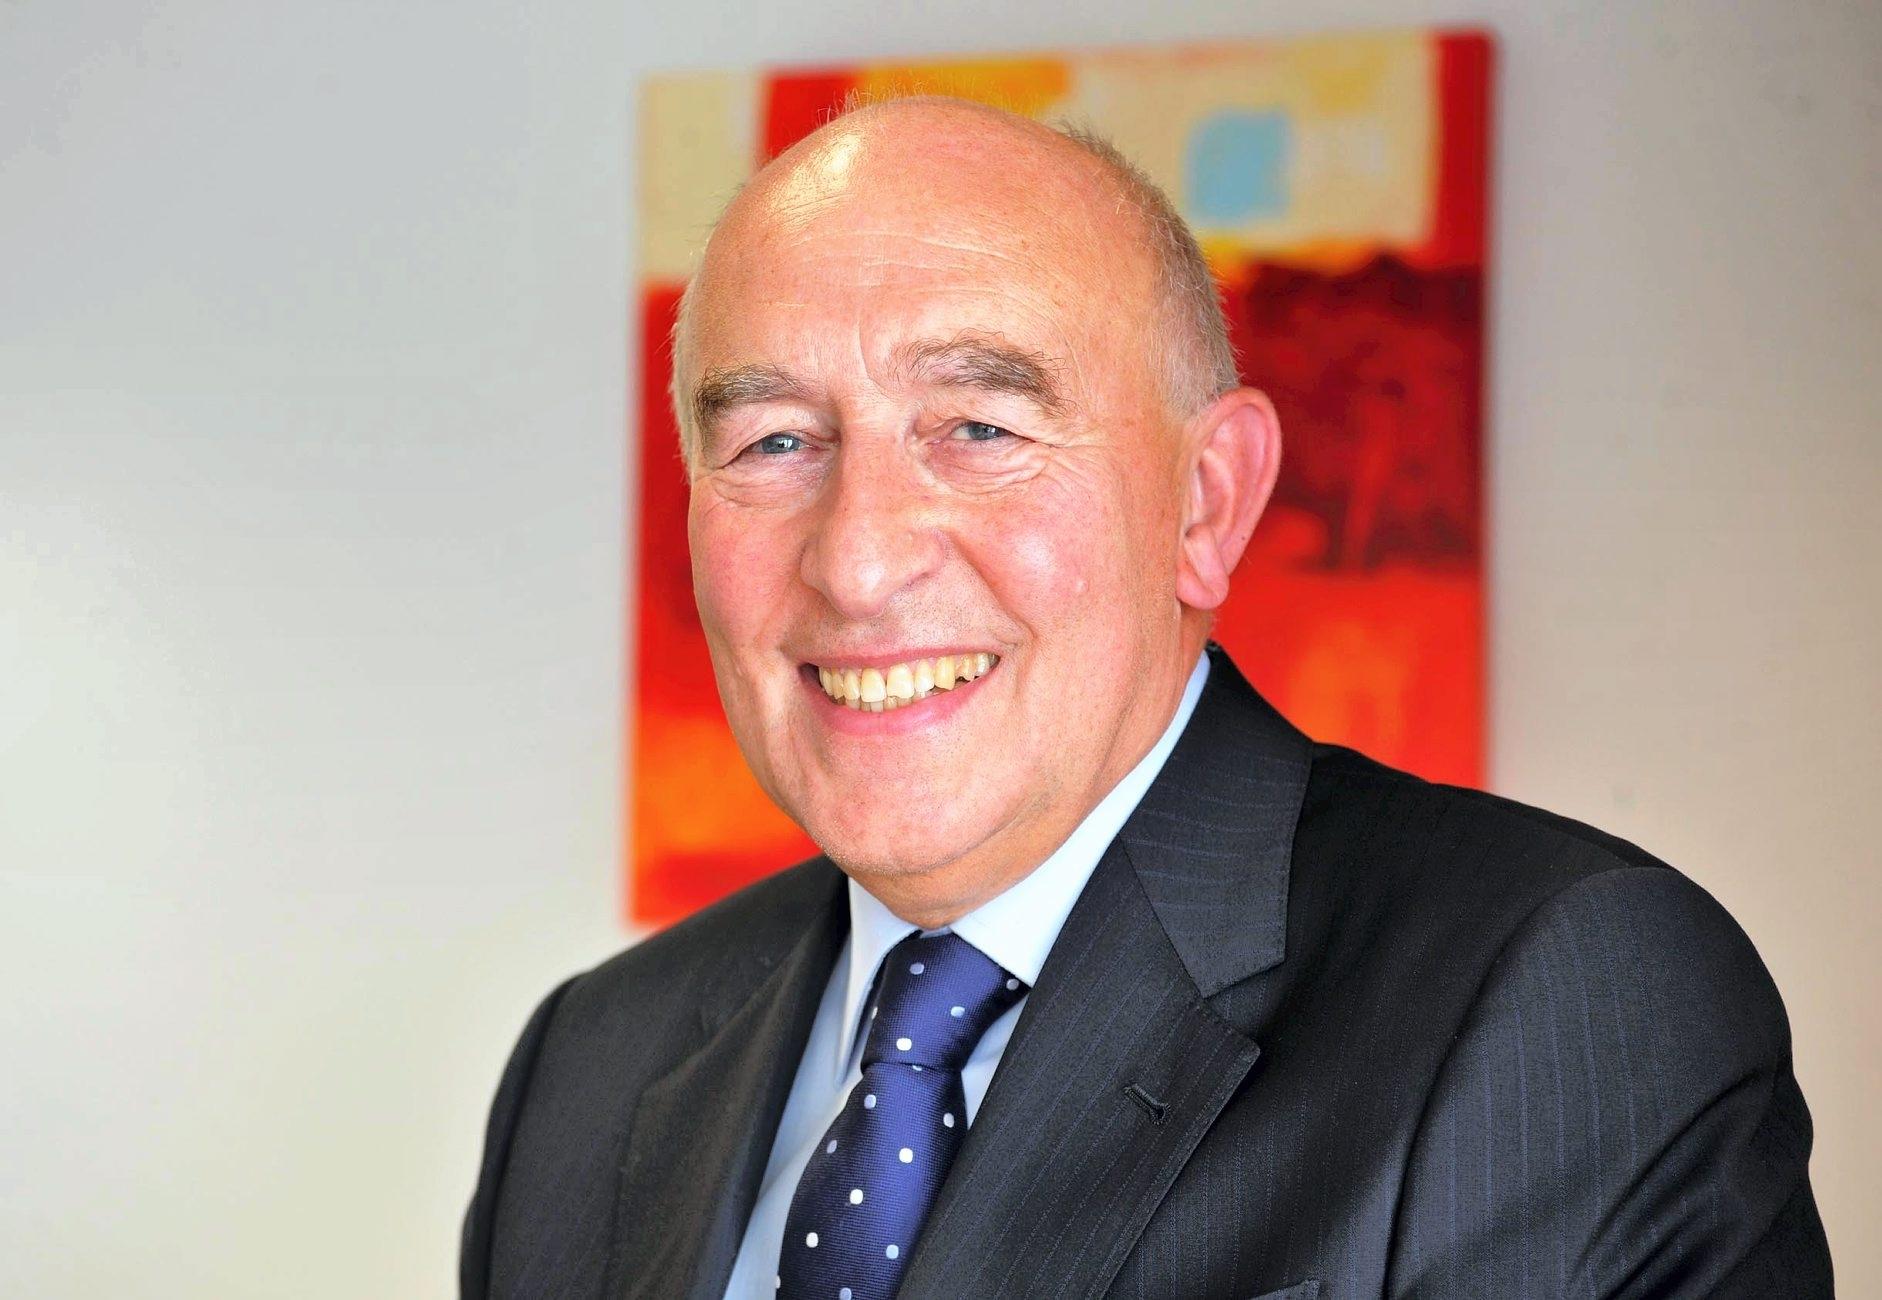 Maurice Watkins, Head of Sports Brabners Chaffe Street - Lifetime Achievement Award Winner